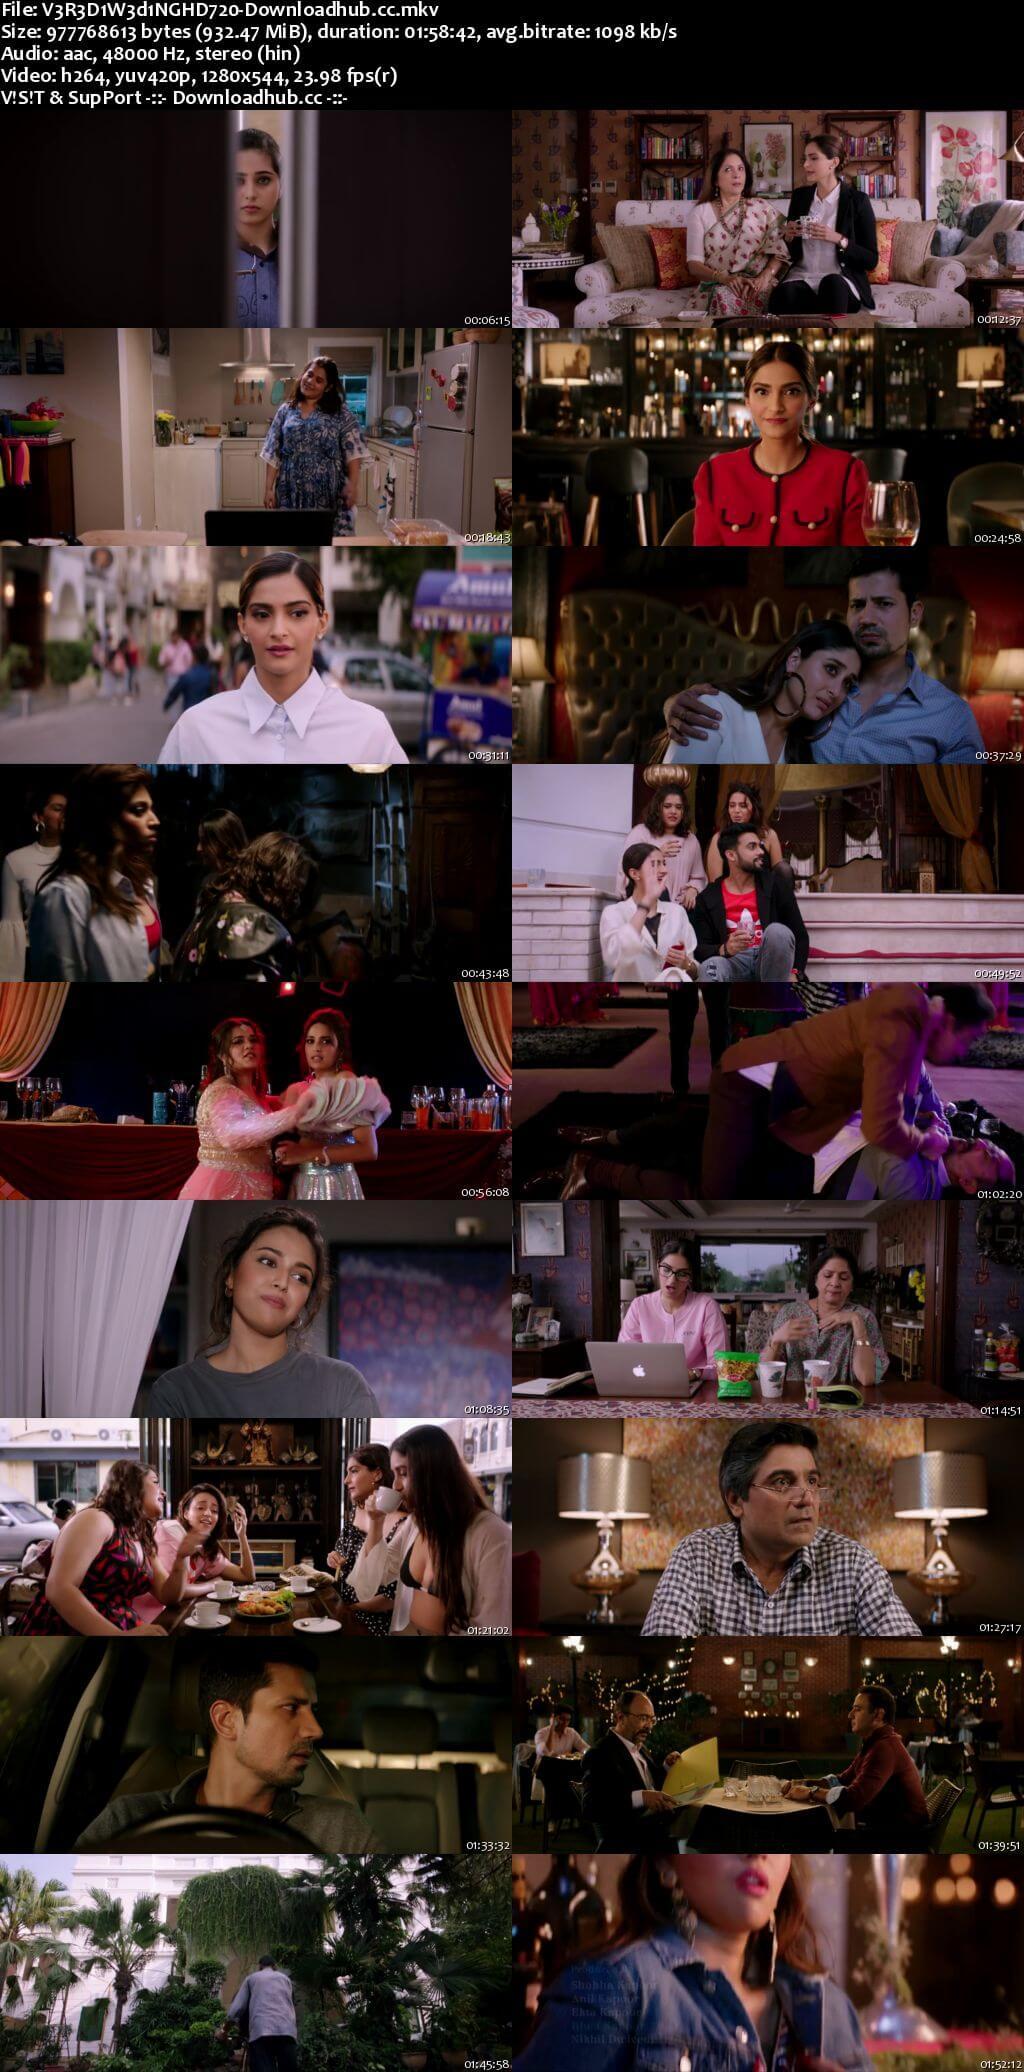 Veere Di Wedding 2018 Hindi 720p HDRip ESubs